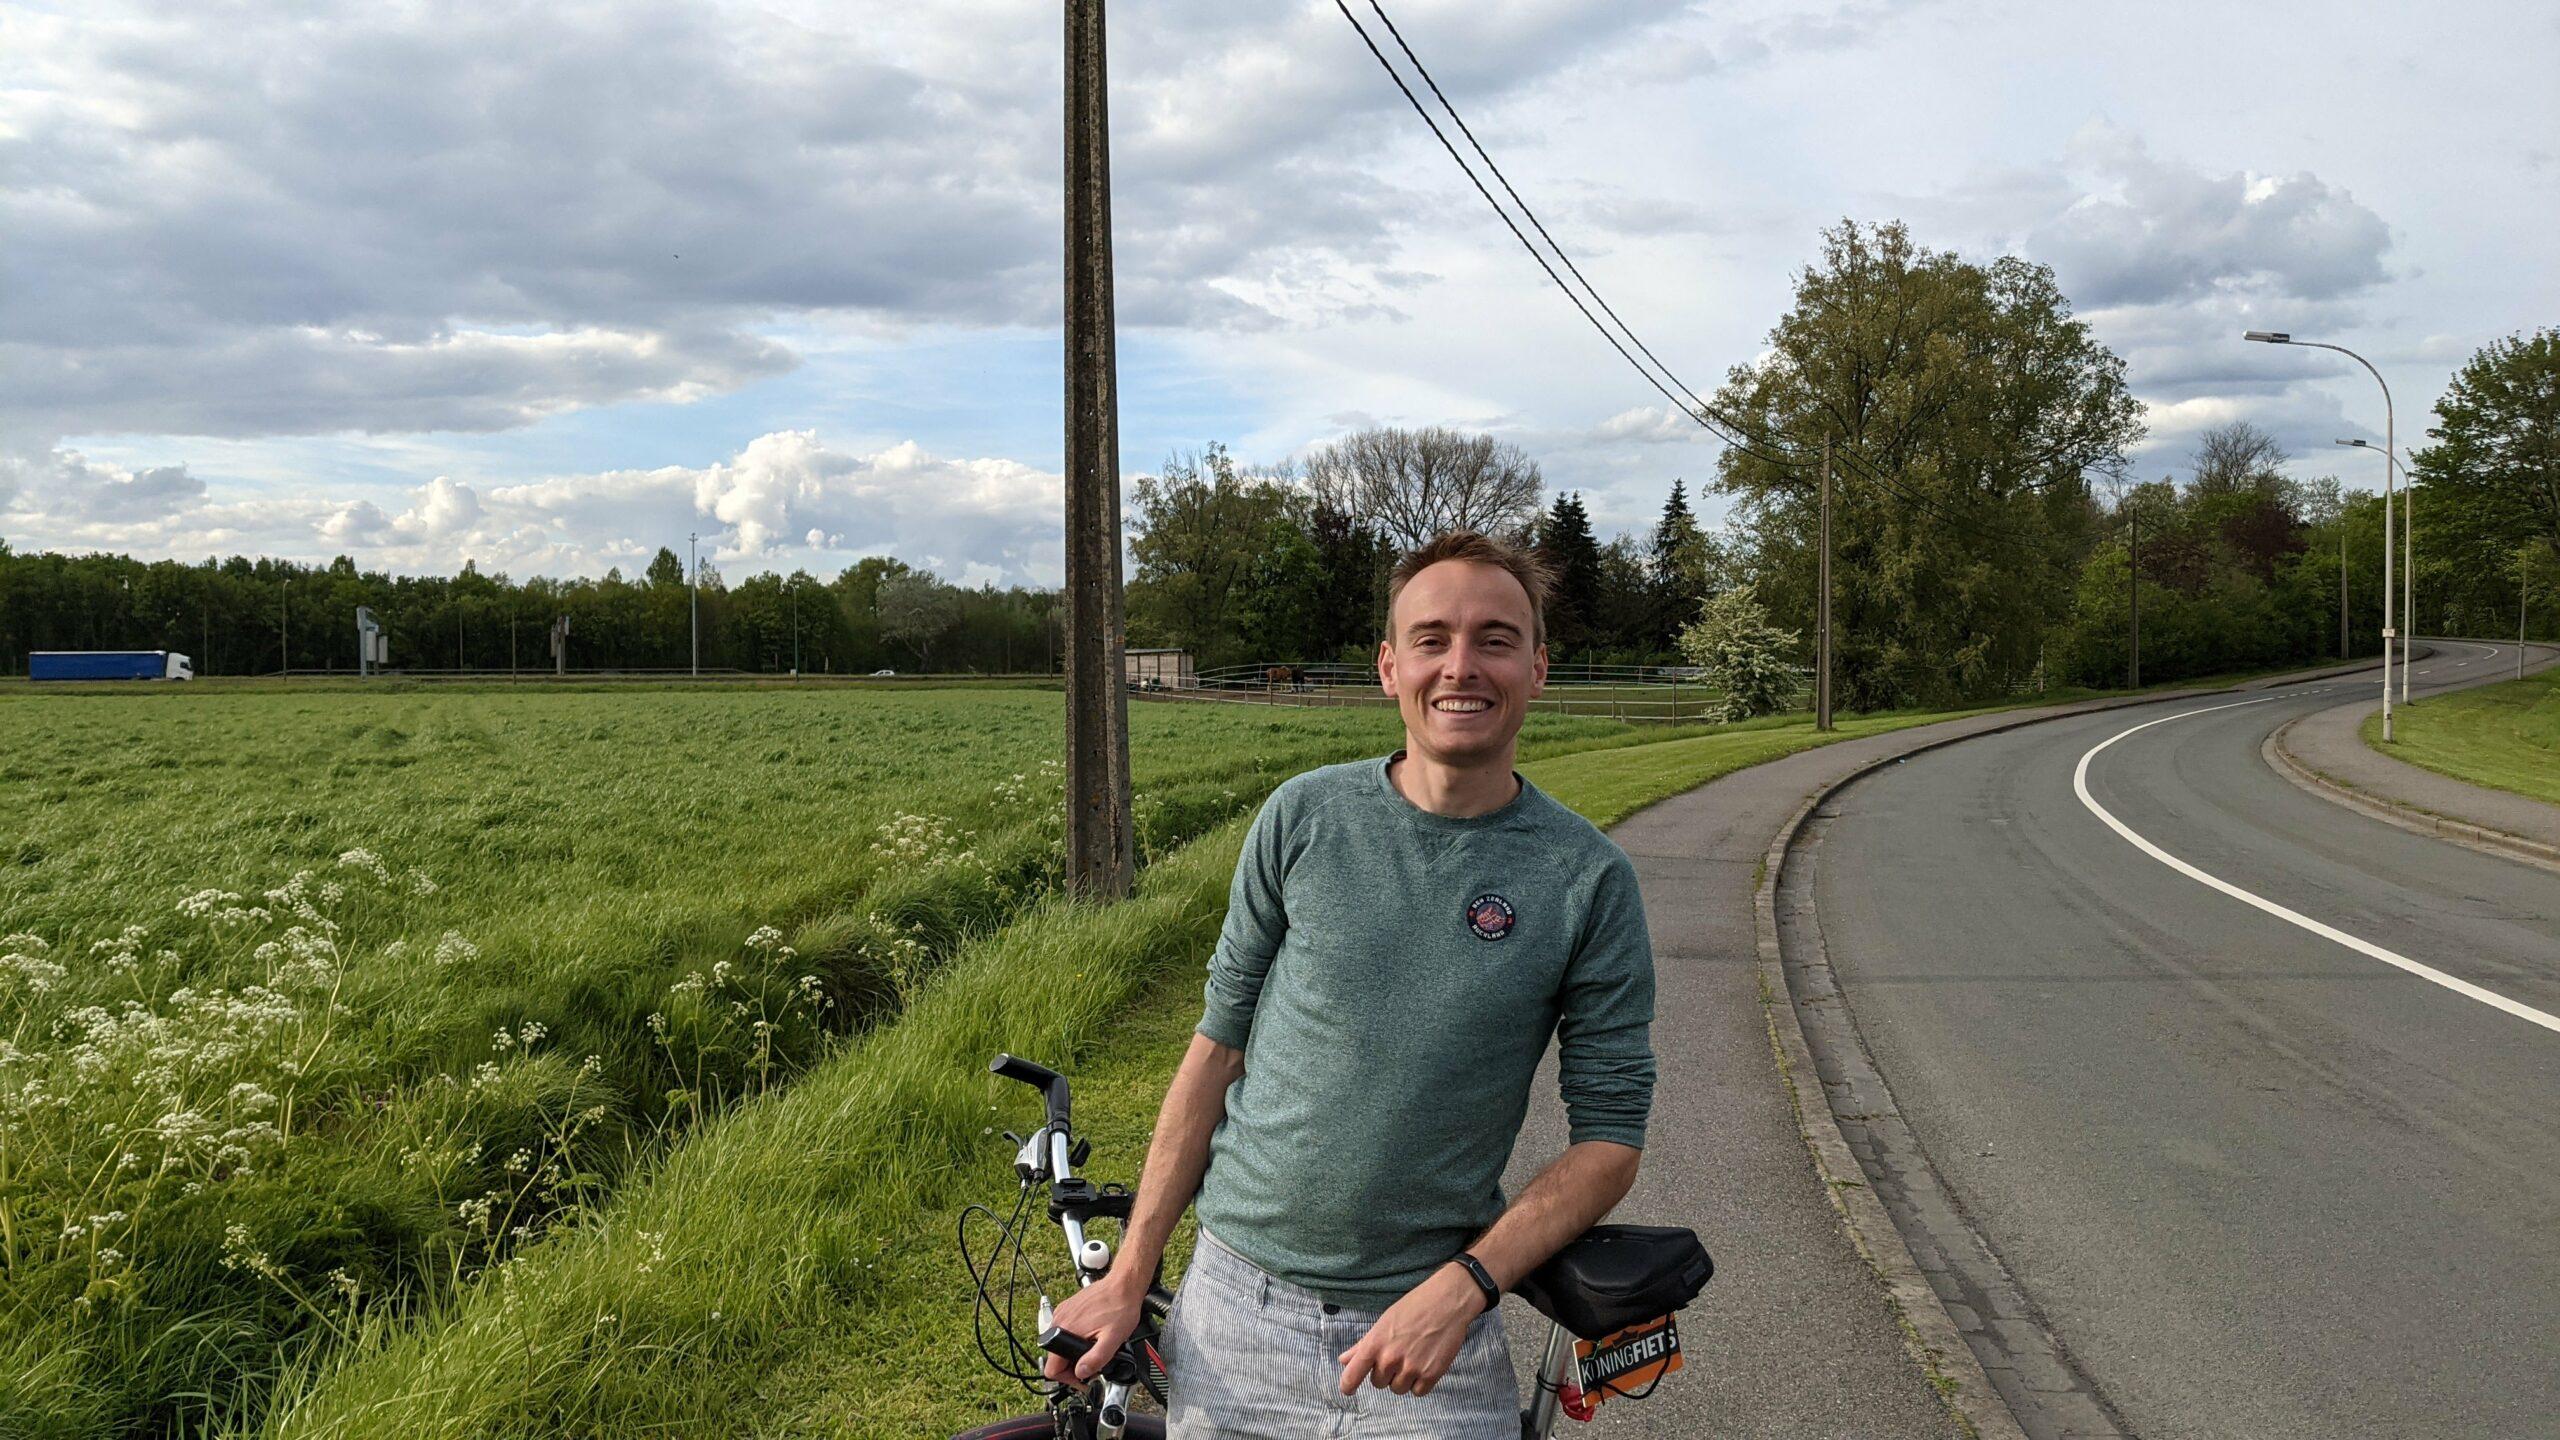 Nieuwe fietspaden op komst in Merksem